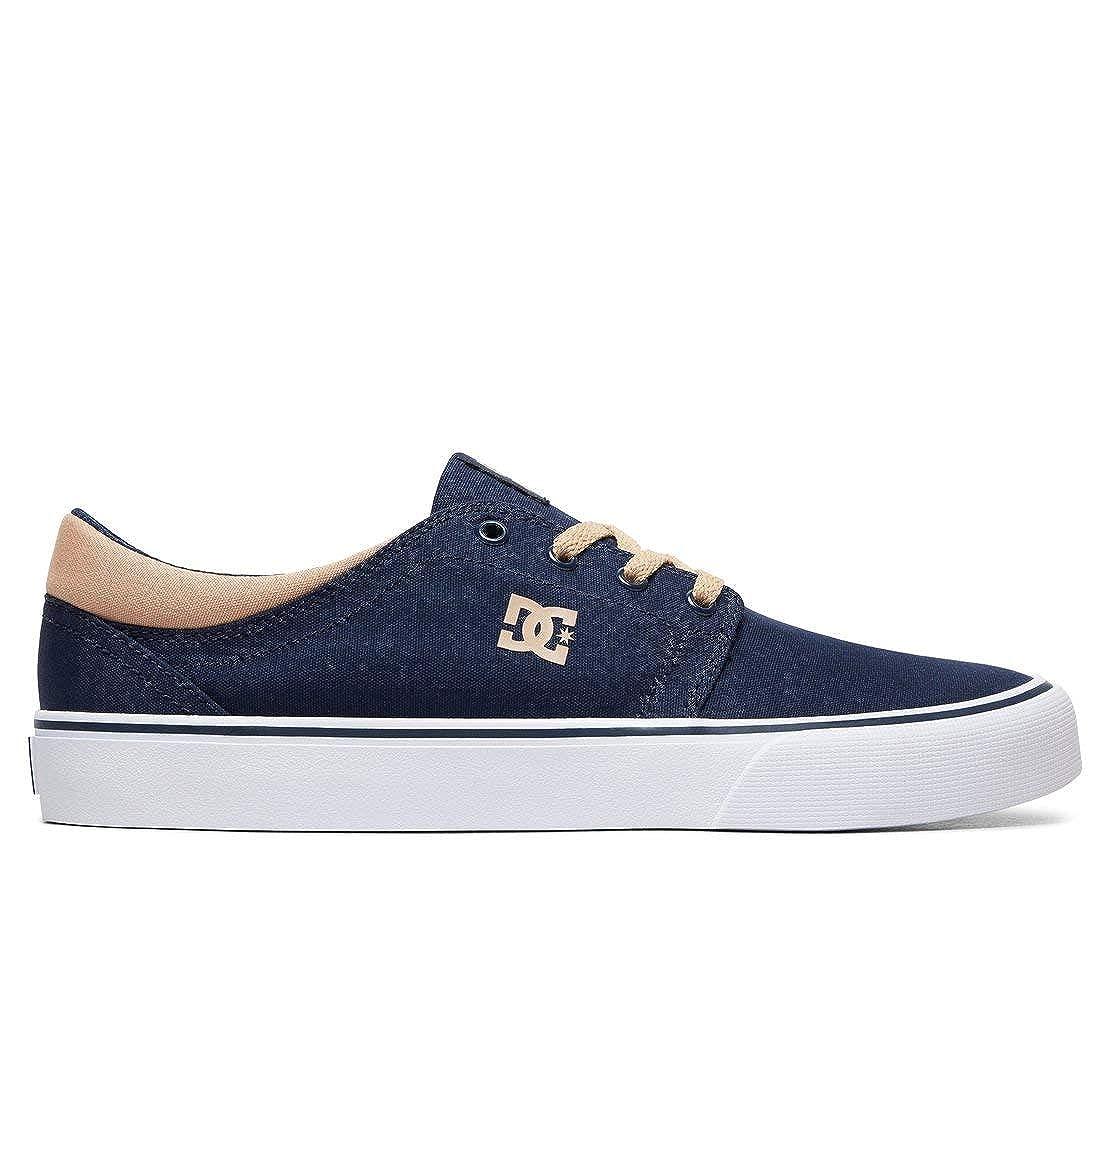 DC scarpe TONIK TONIK TONIK - Scarpe da Ginnastica Basse Uomo | Ammenda Di Lavorazione  60ed03